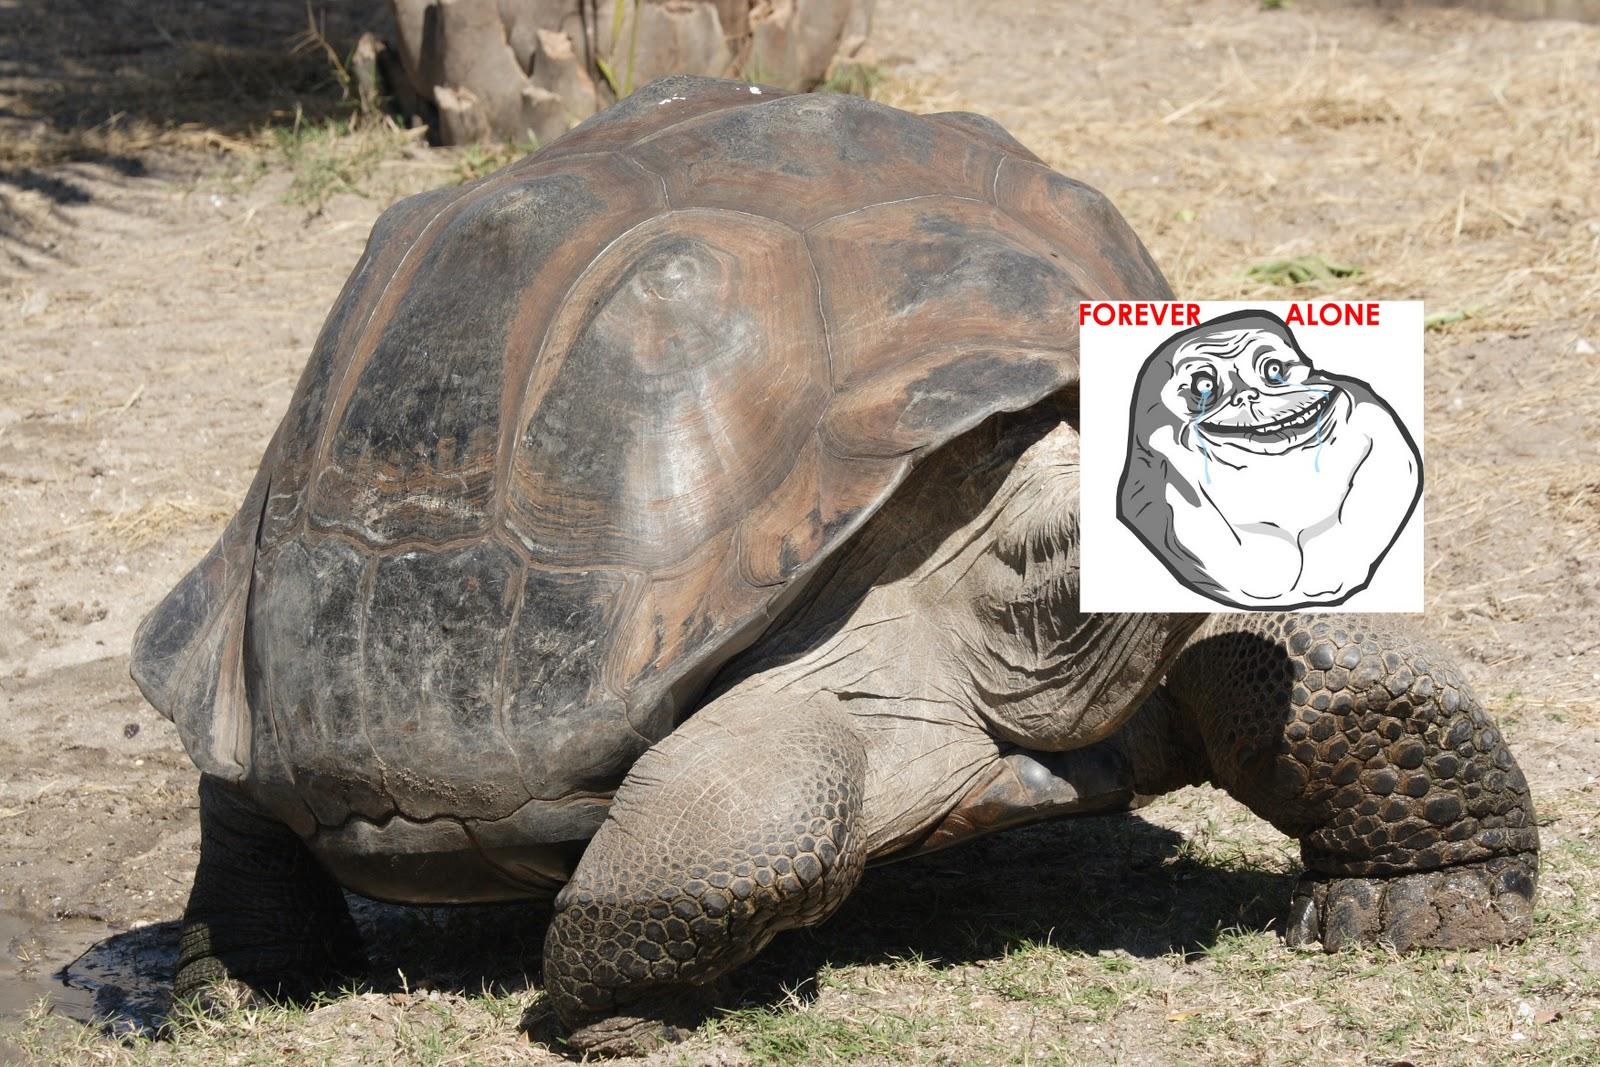 http://2.bp.blogspot.com/-1No01wkPsnM/TwwuboUX0hI/AAAAAAAAAmE/5gw173_Cefg/s1600/Galapagos_giant_tortoise_Geochelone_elephantopus2.jpg